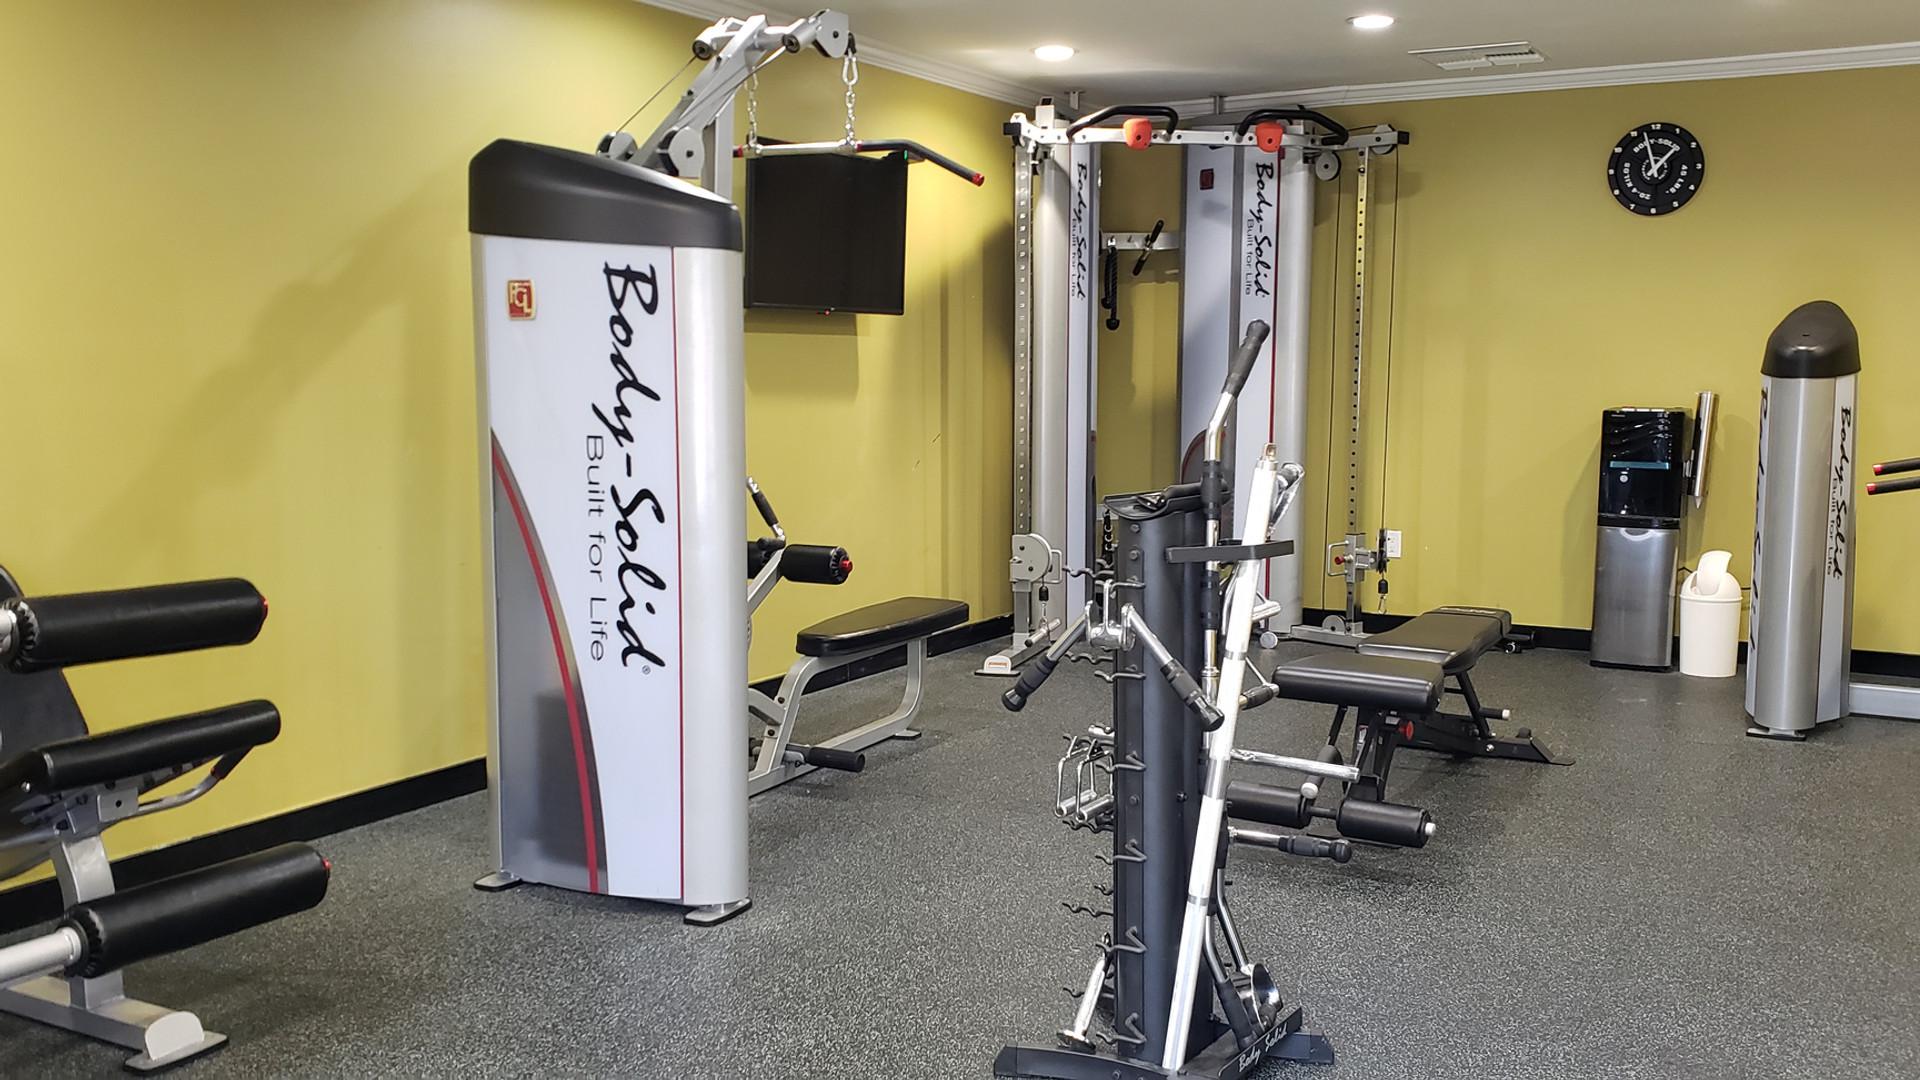 Gym - Strength Machines.jpg